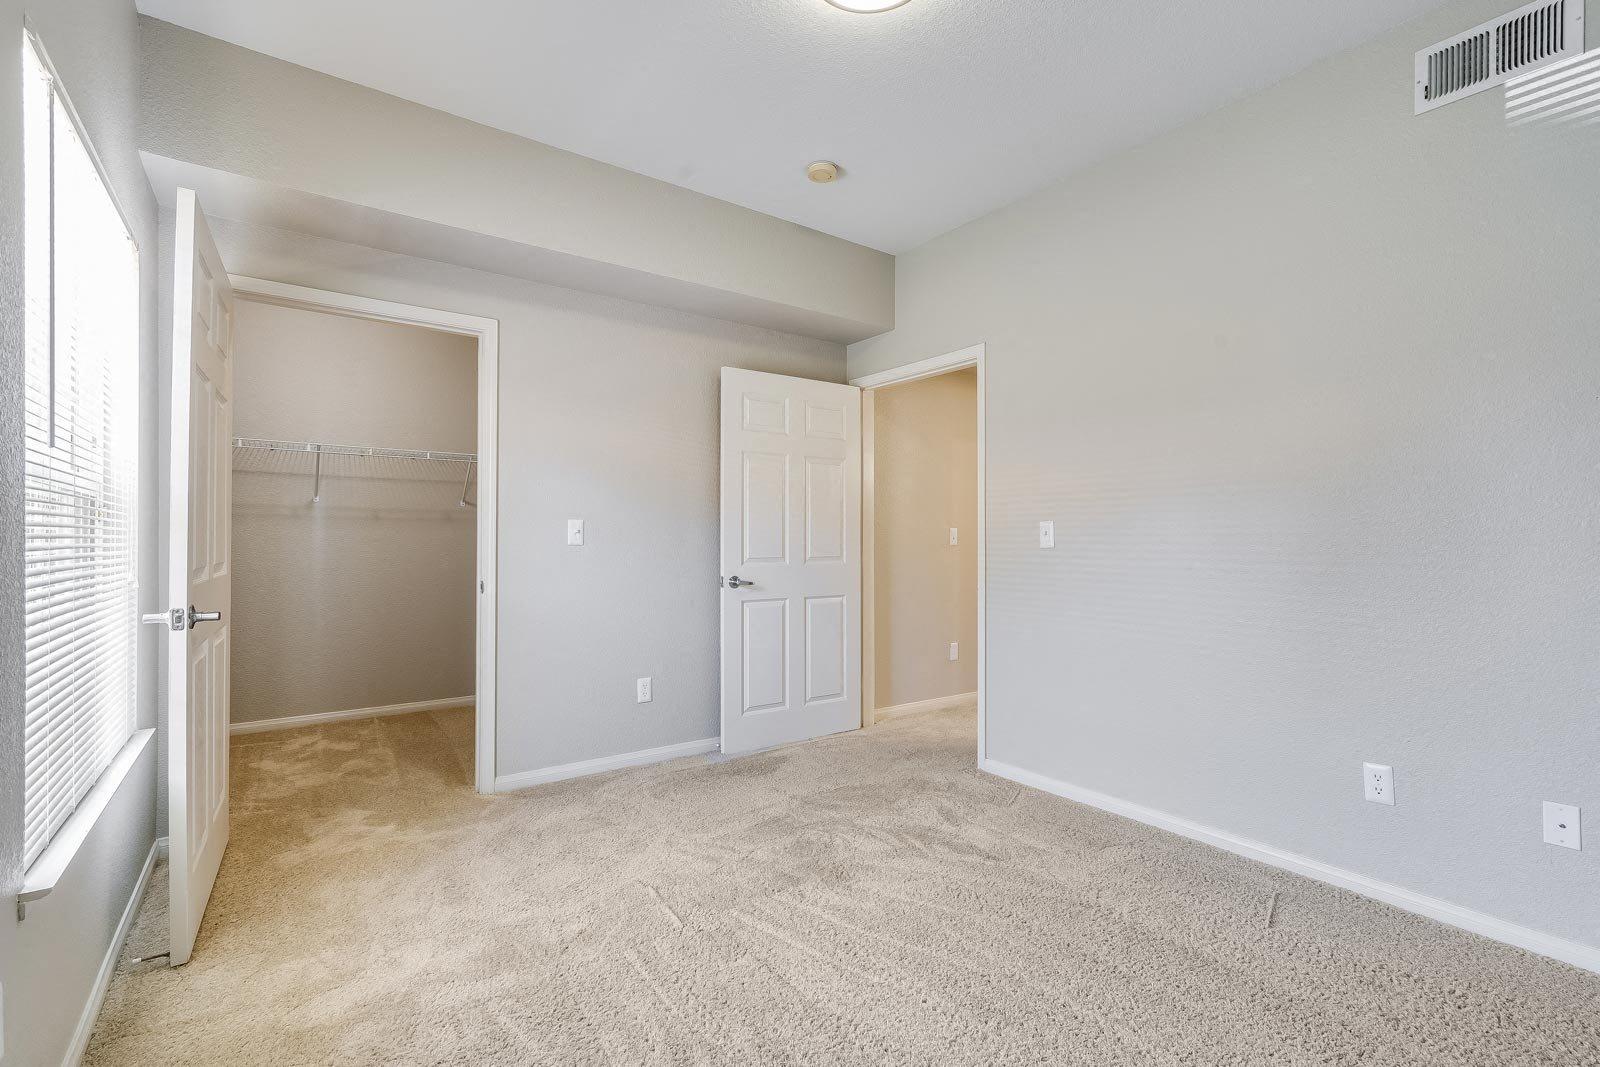 Large Closets at Windsor at Redwood Creek, 94928, CA